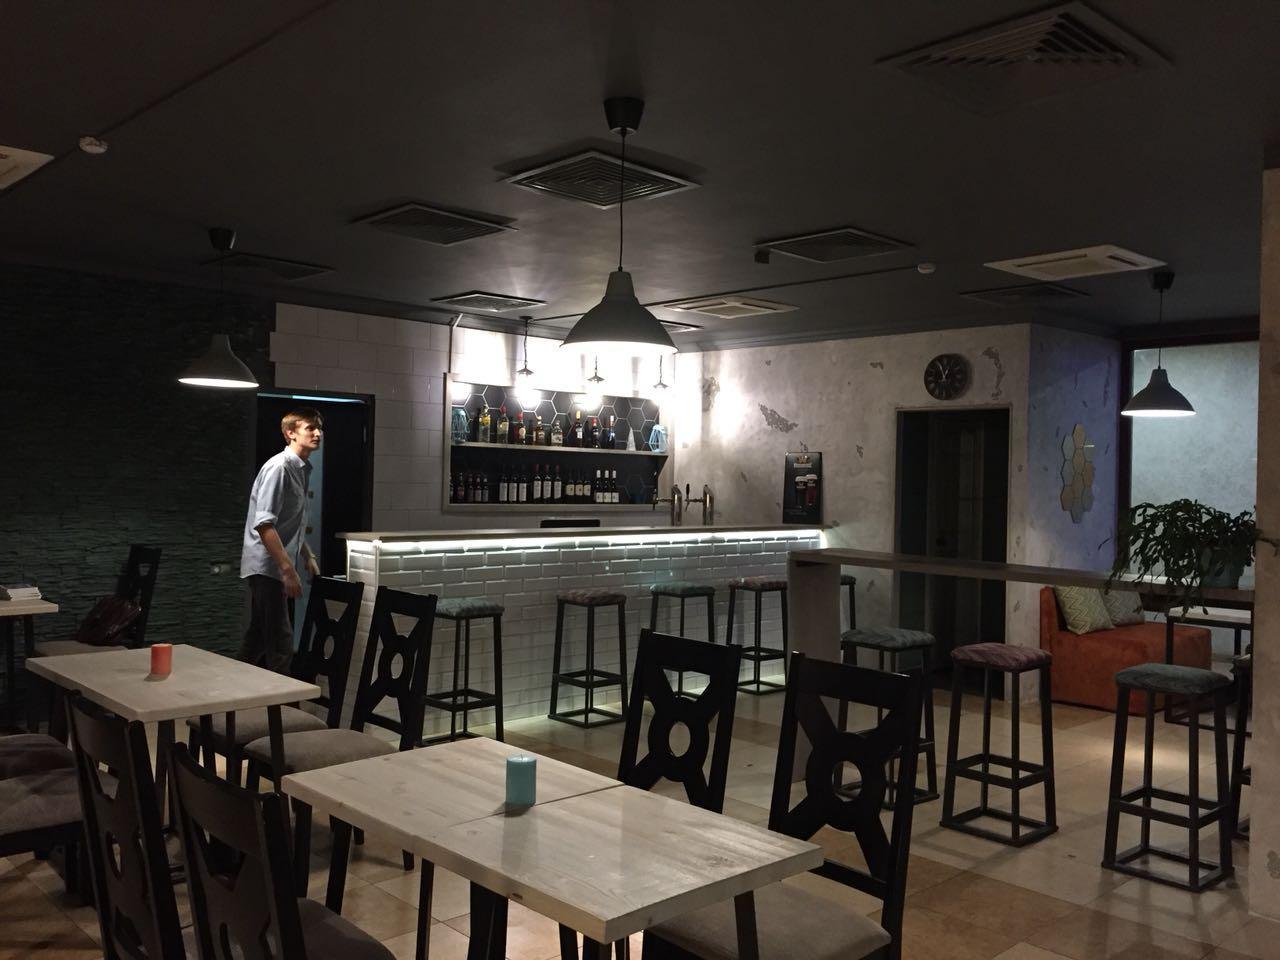 Кафе бар в Красной поляне - image photo-2018-08-13-02-41-41-1 on http://bizneskvartal.ru